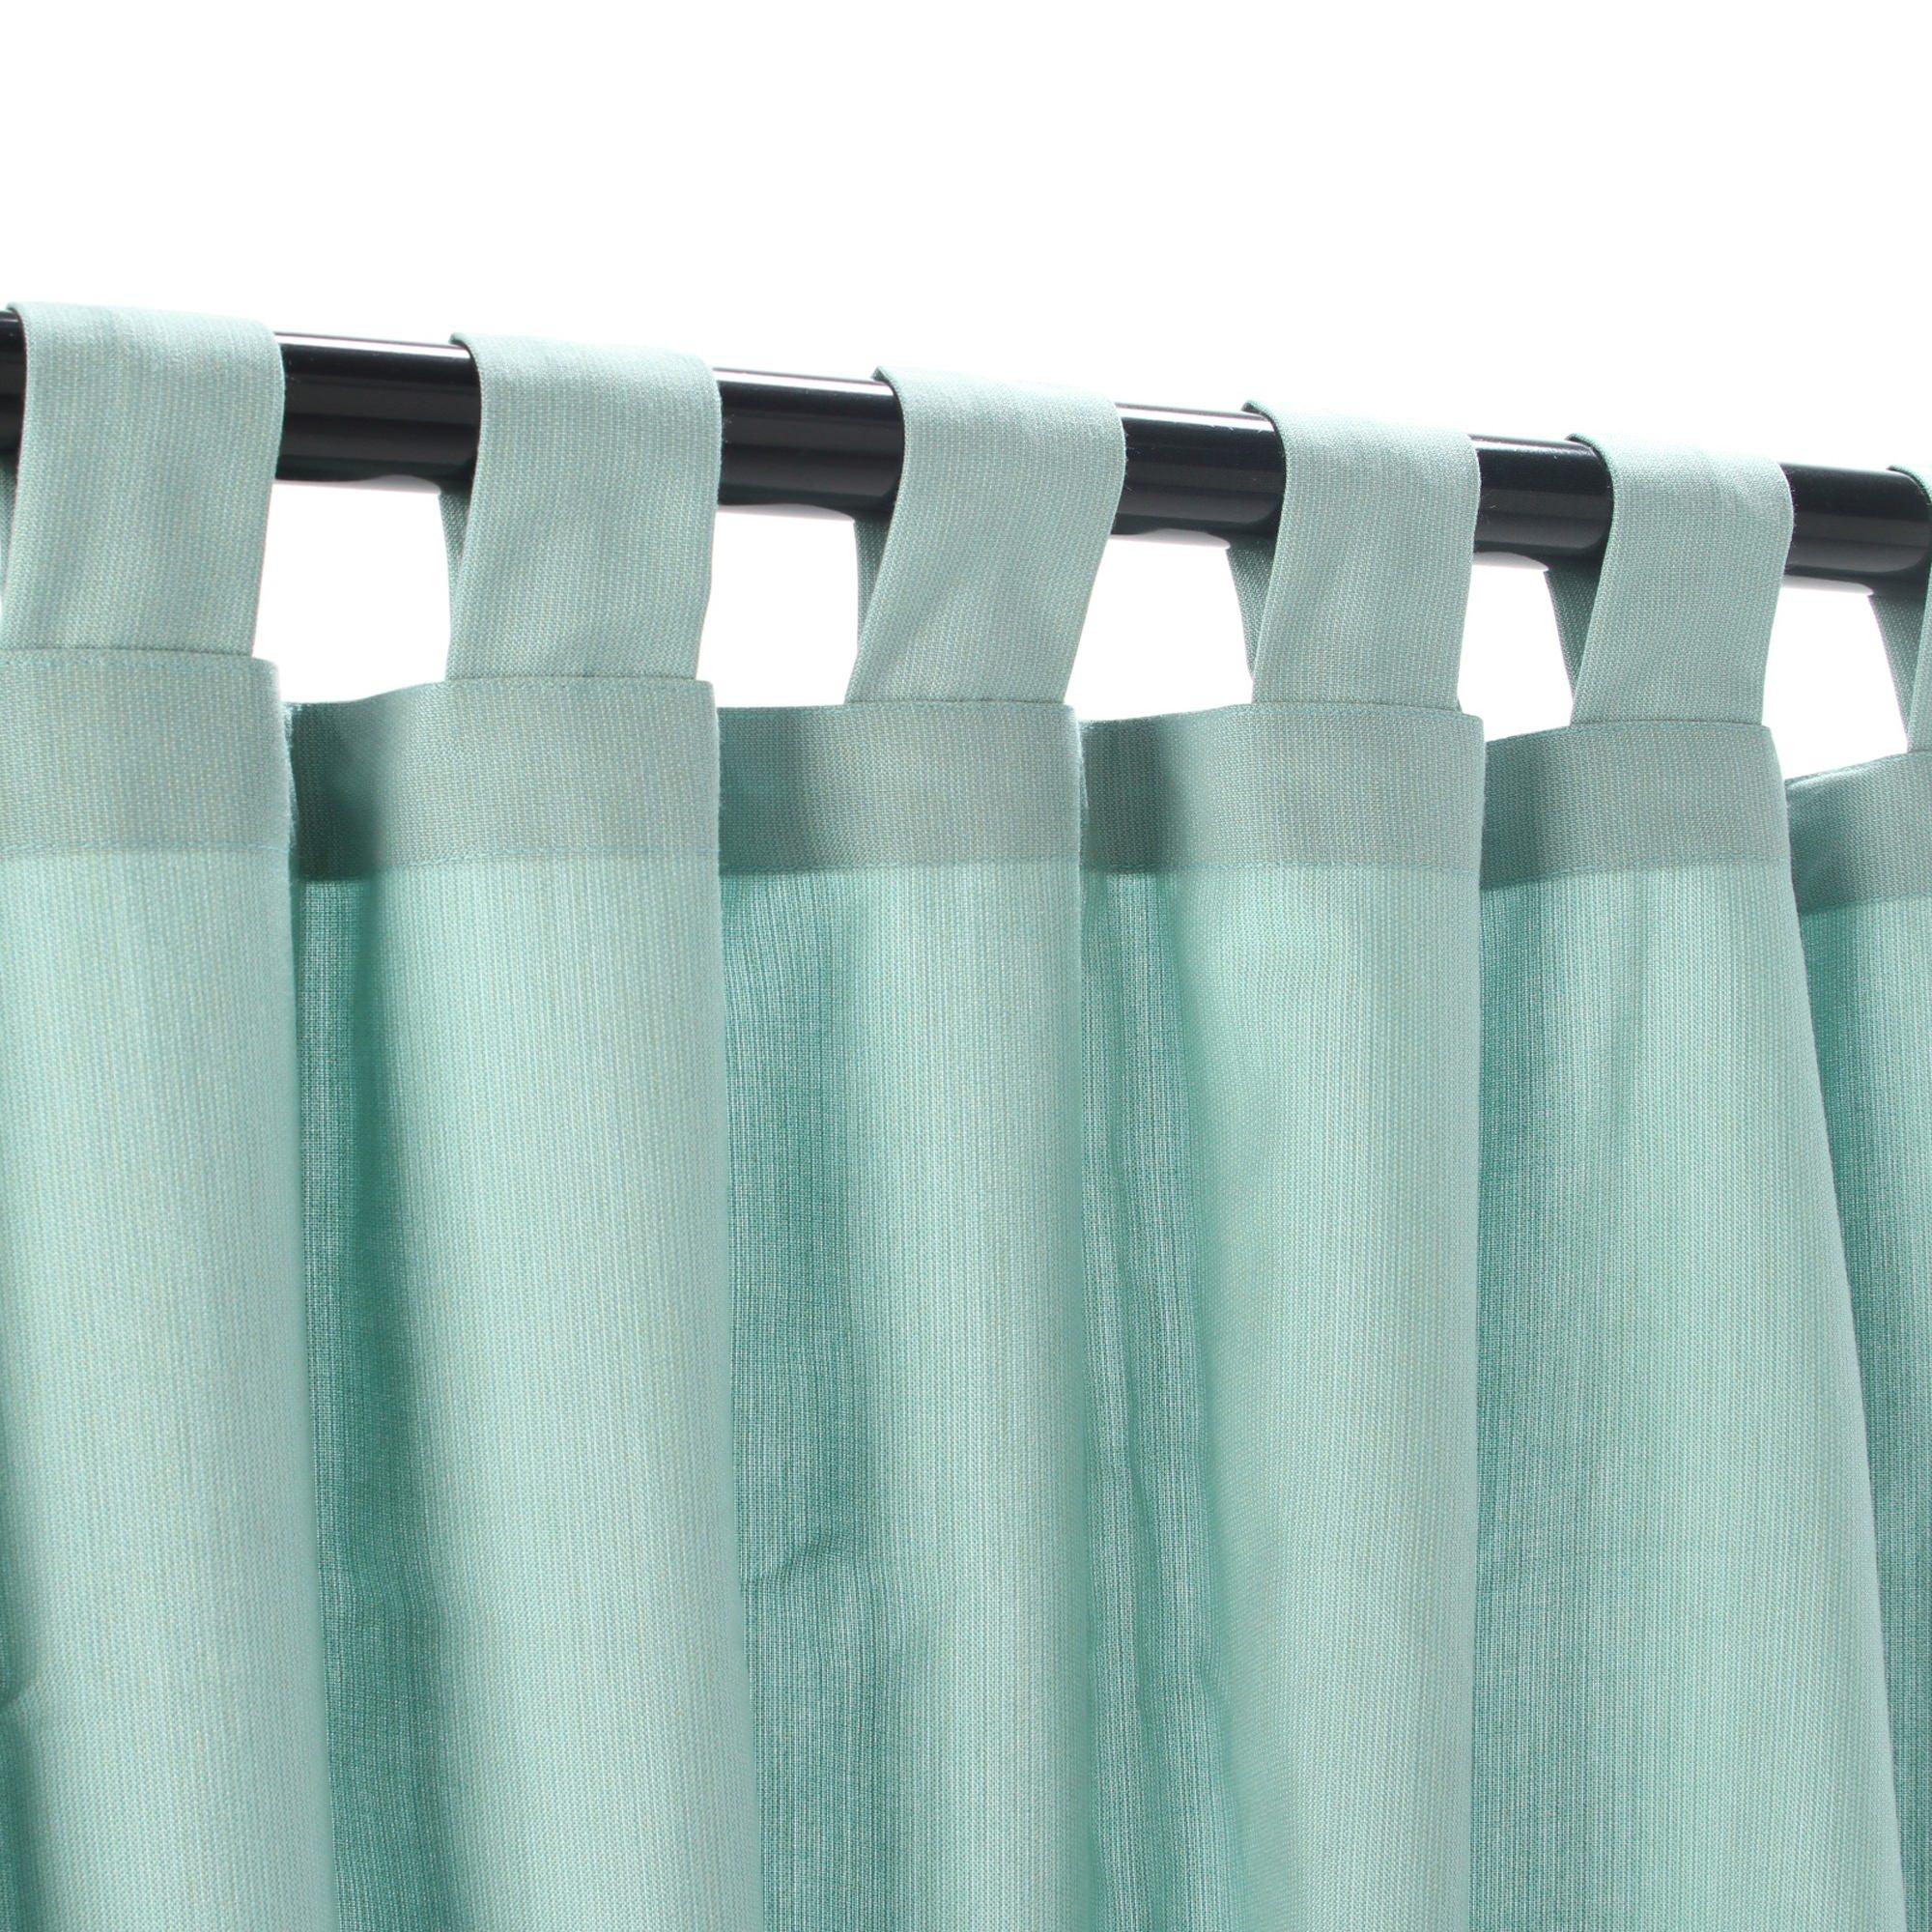 Mist Tabbed Sunbrella Outdoor Curtains